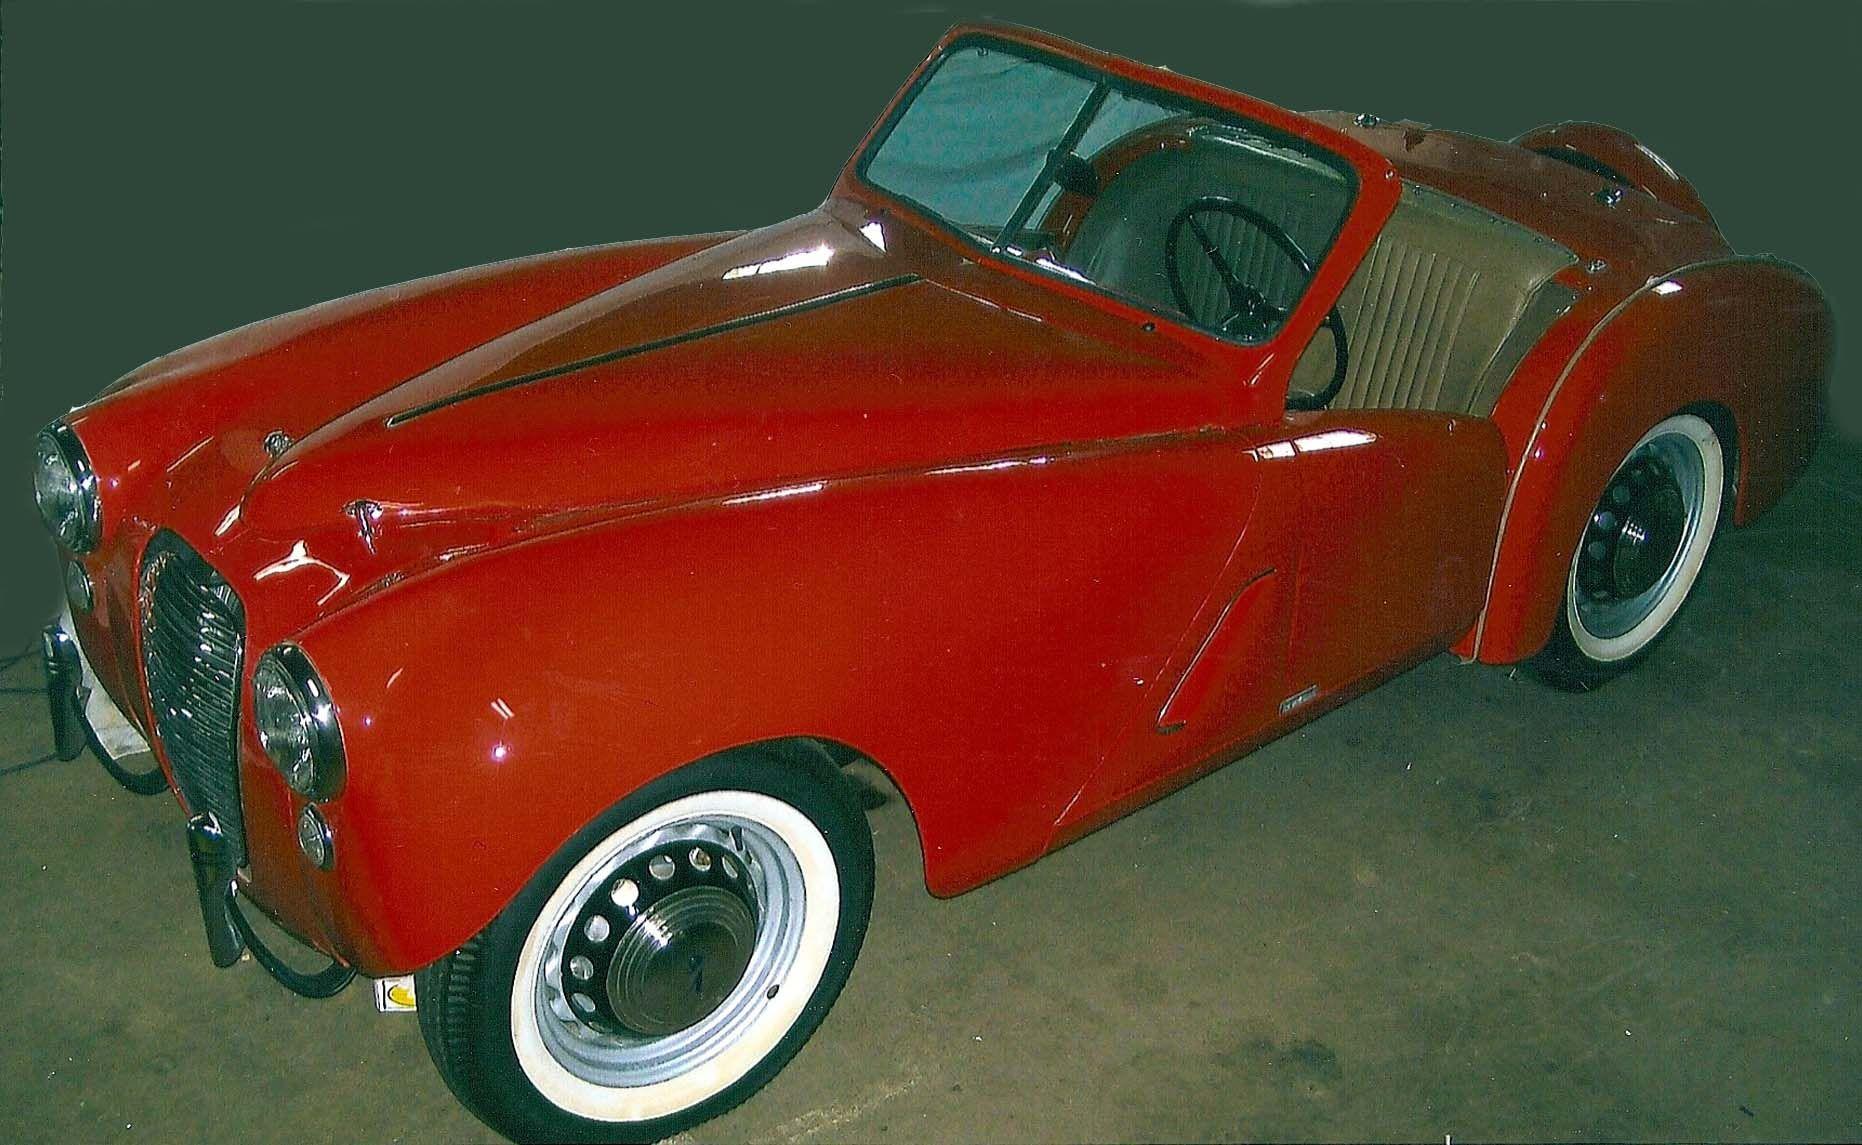 Return of the Renville: Custom sportscar back in spotlight - Old ...